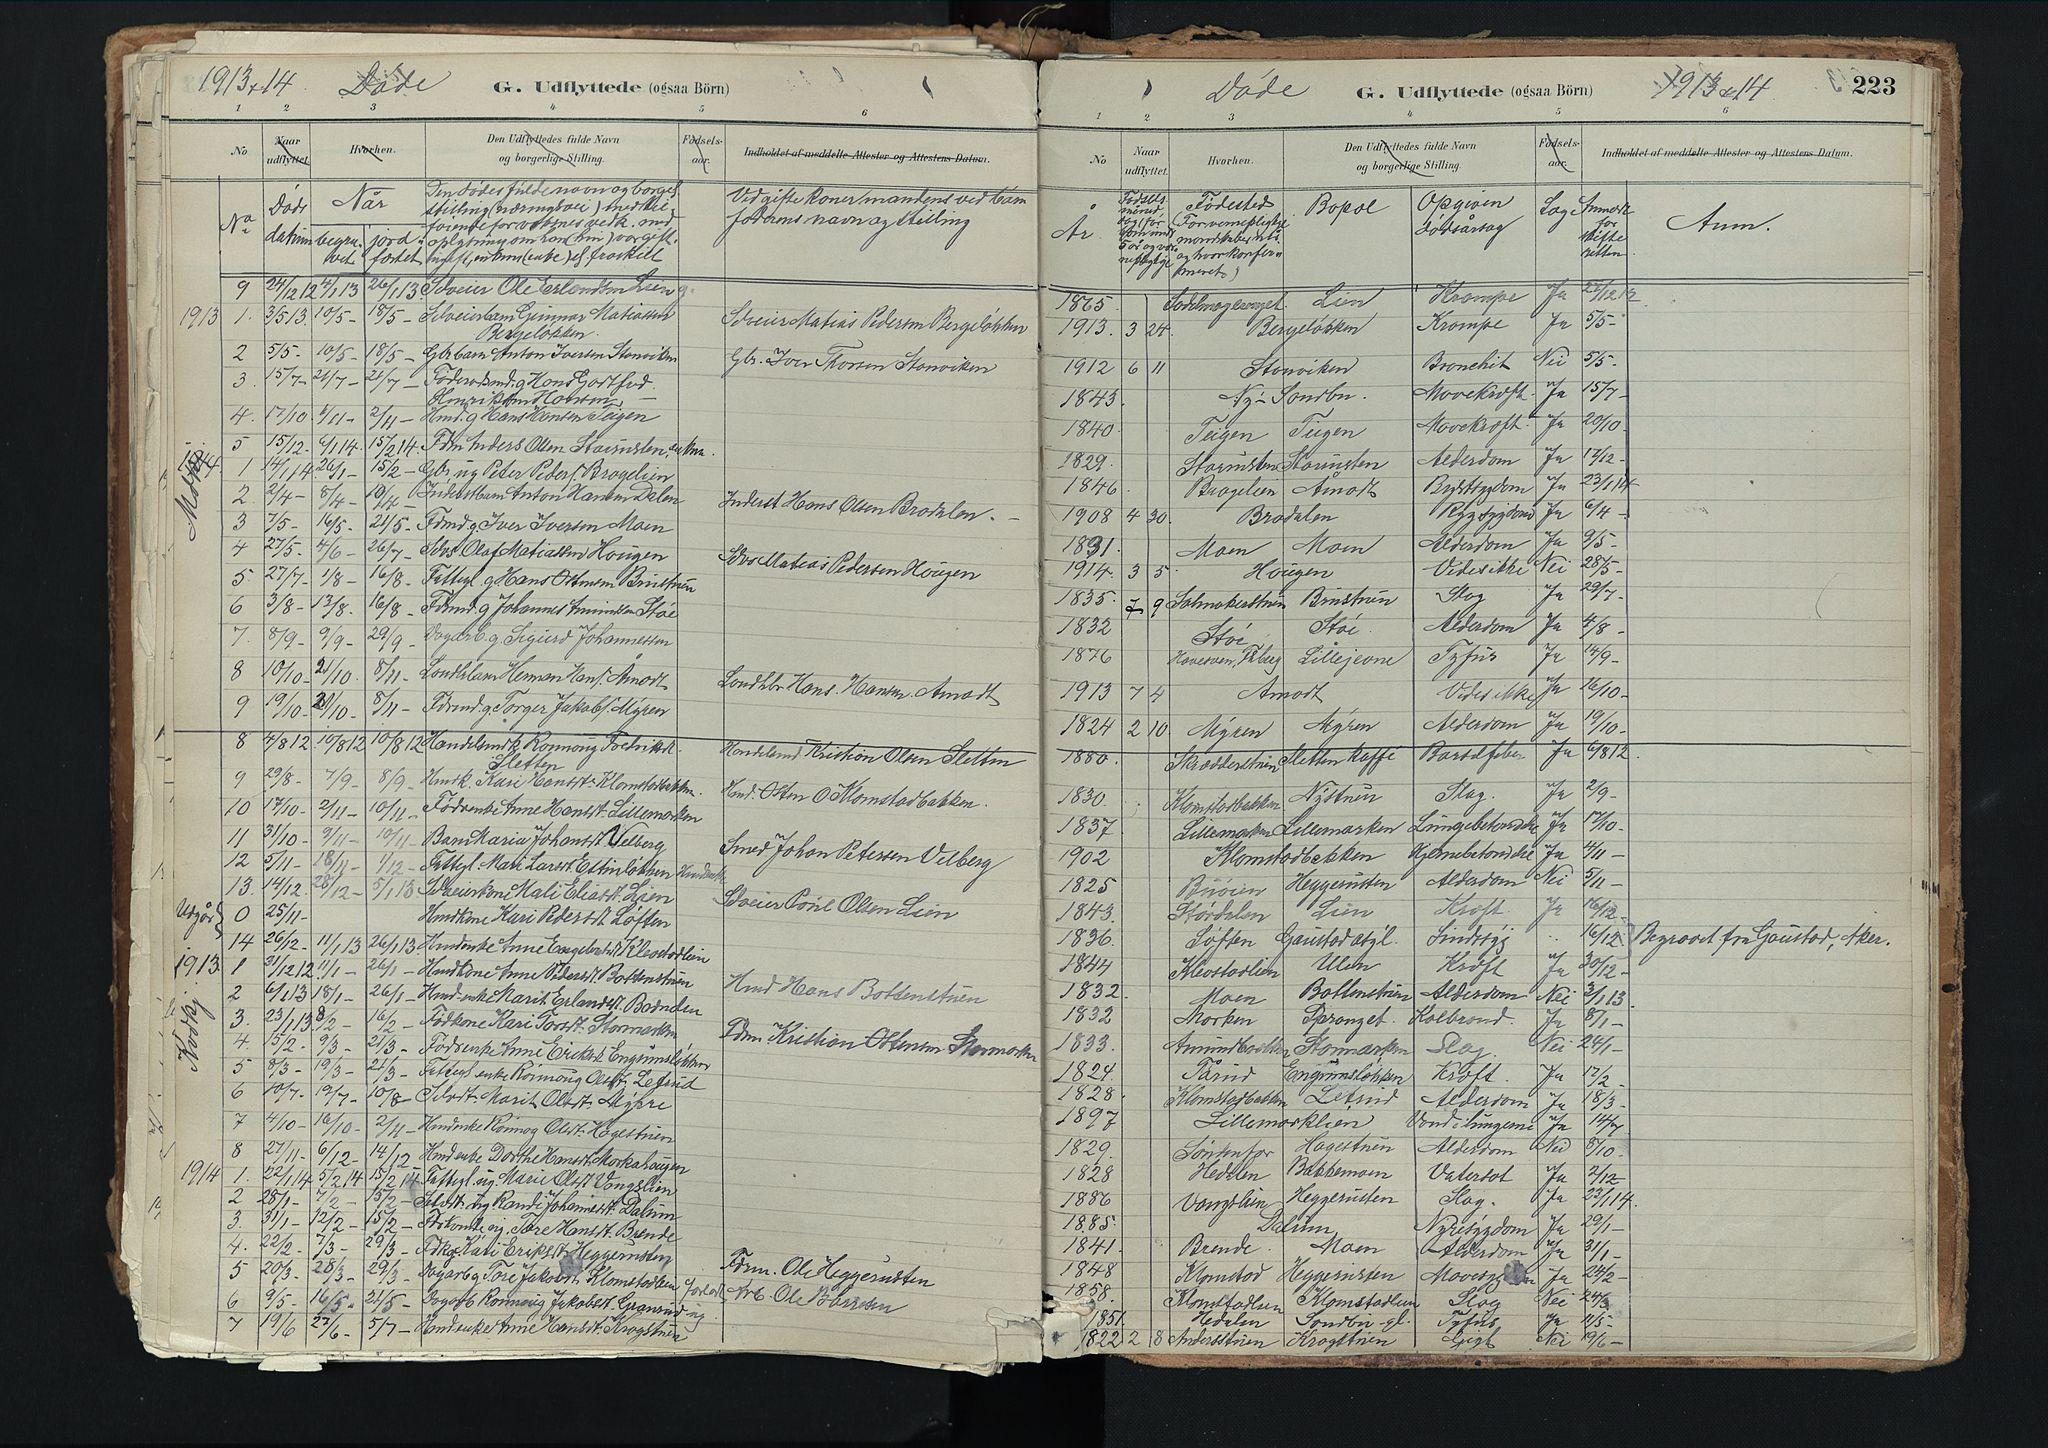 SAH, Nord-Fron prestekontor, Ministerialbok nr. 3, 1884-1914, s. 223